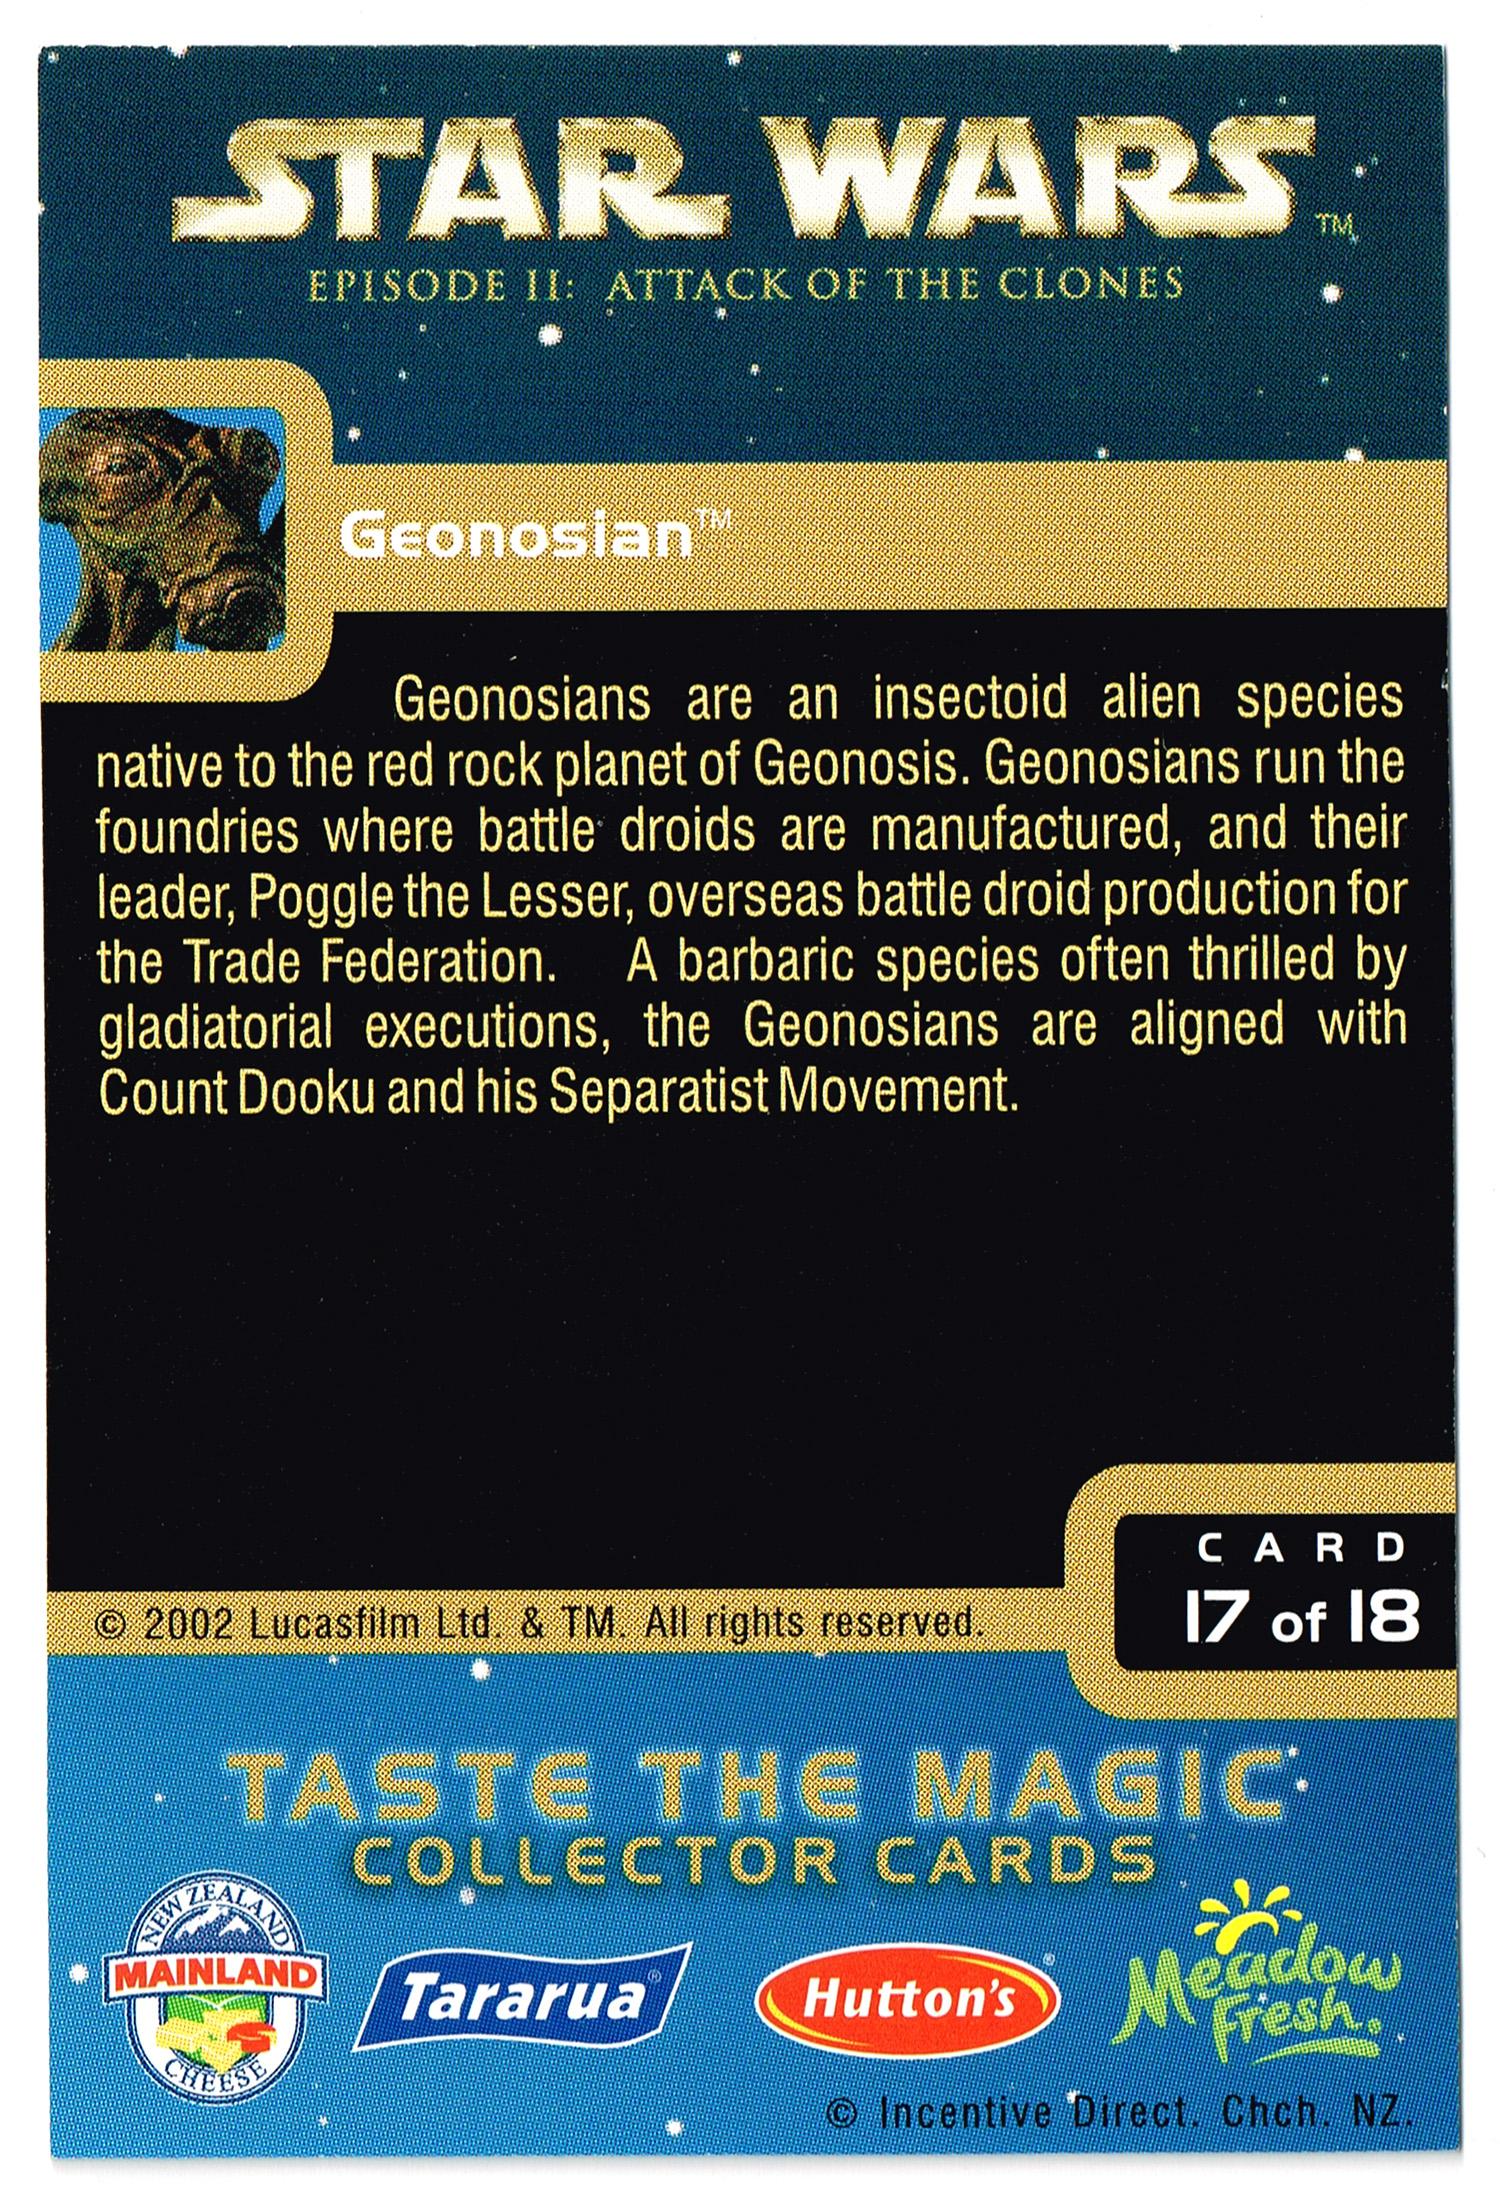 """Taste the Magic"" Collector Card 17 - Geonosian"